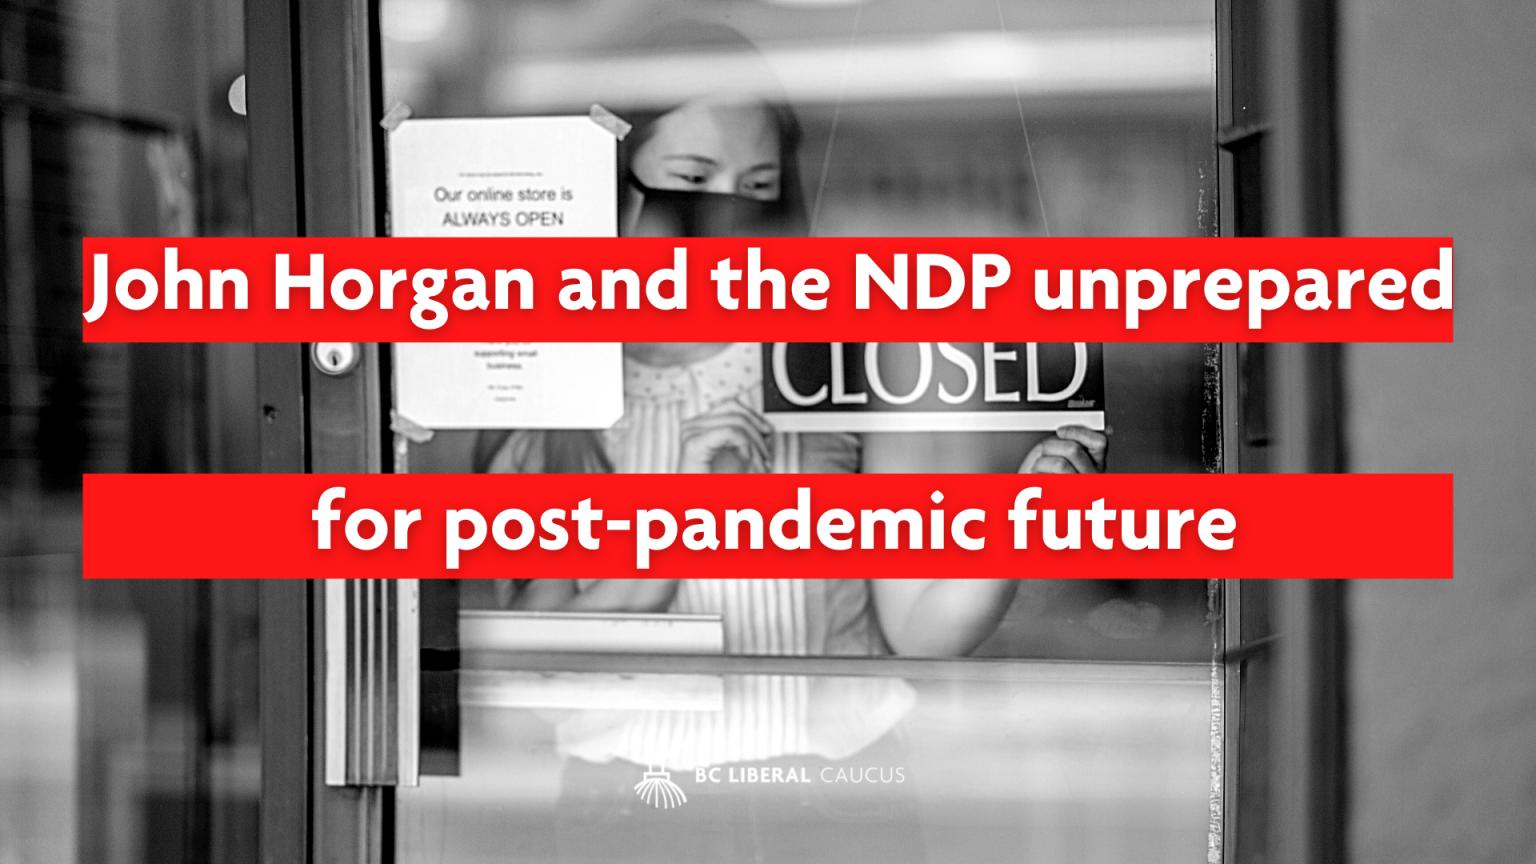 John Horgan and the NDP unprepared for post-pandemic future